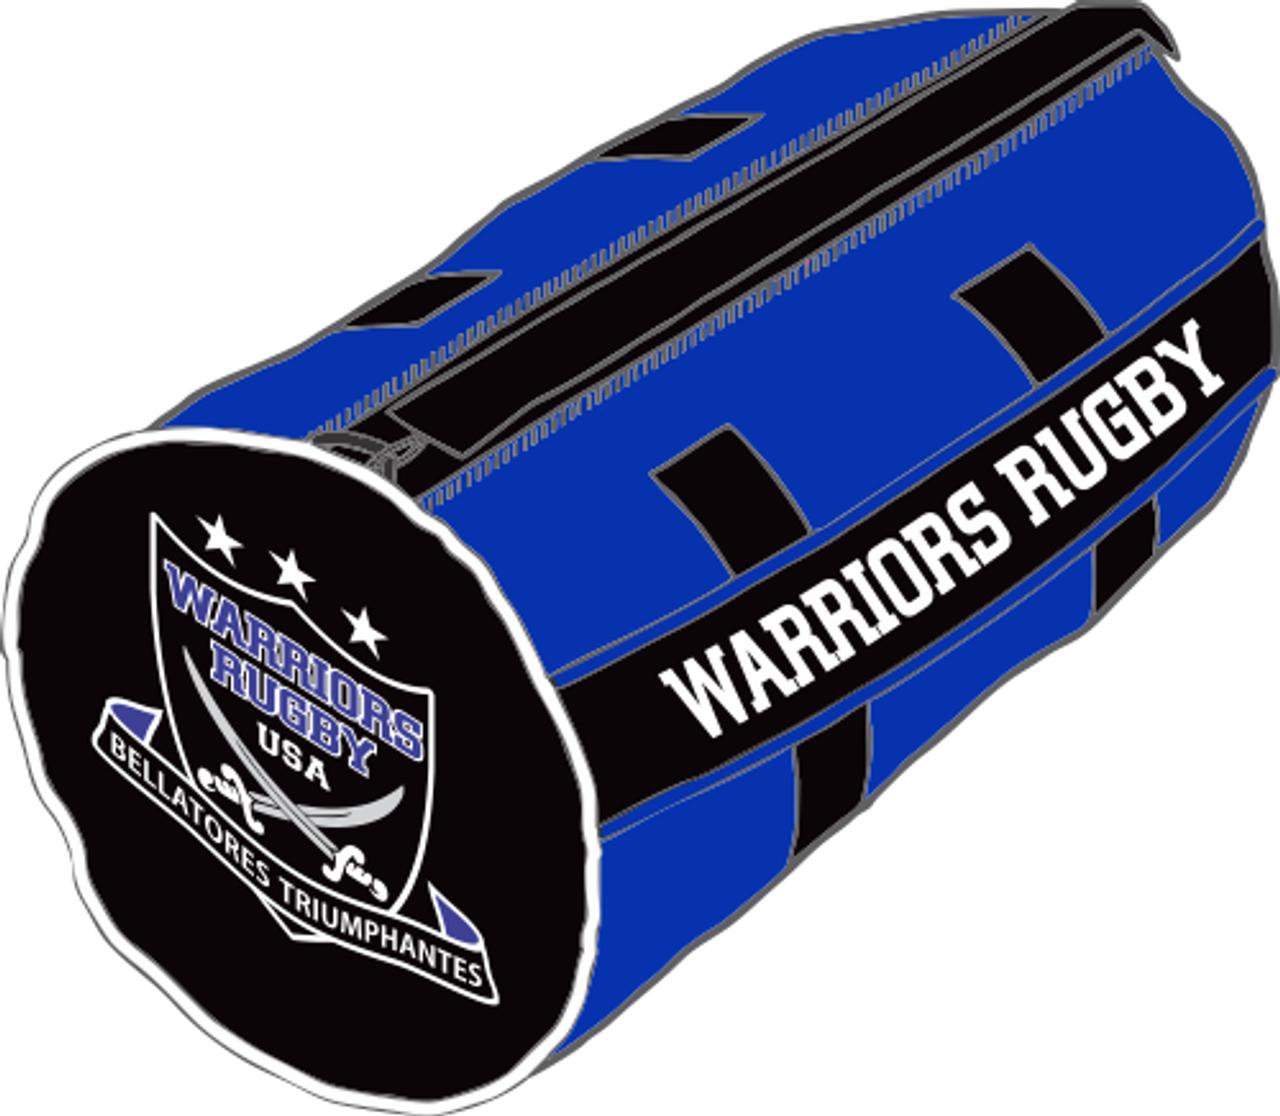 Warriors Custom Kitbag